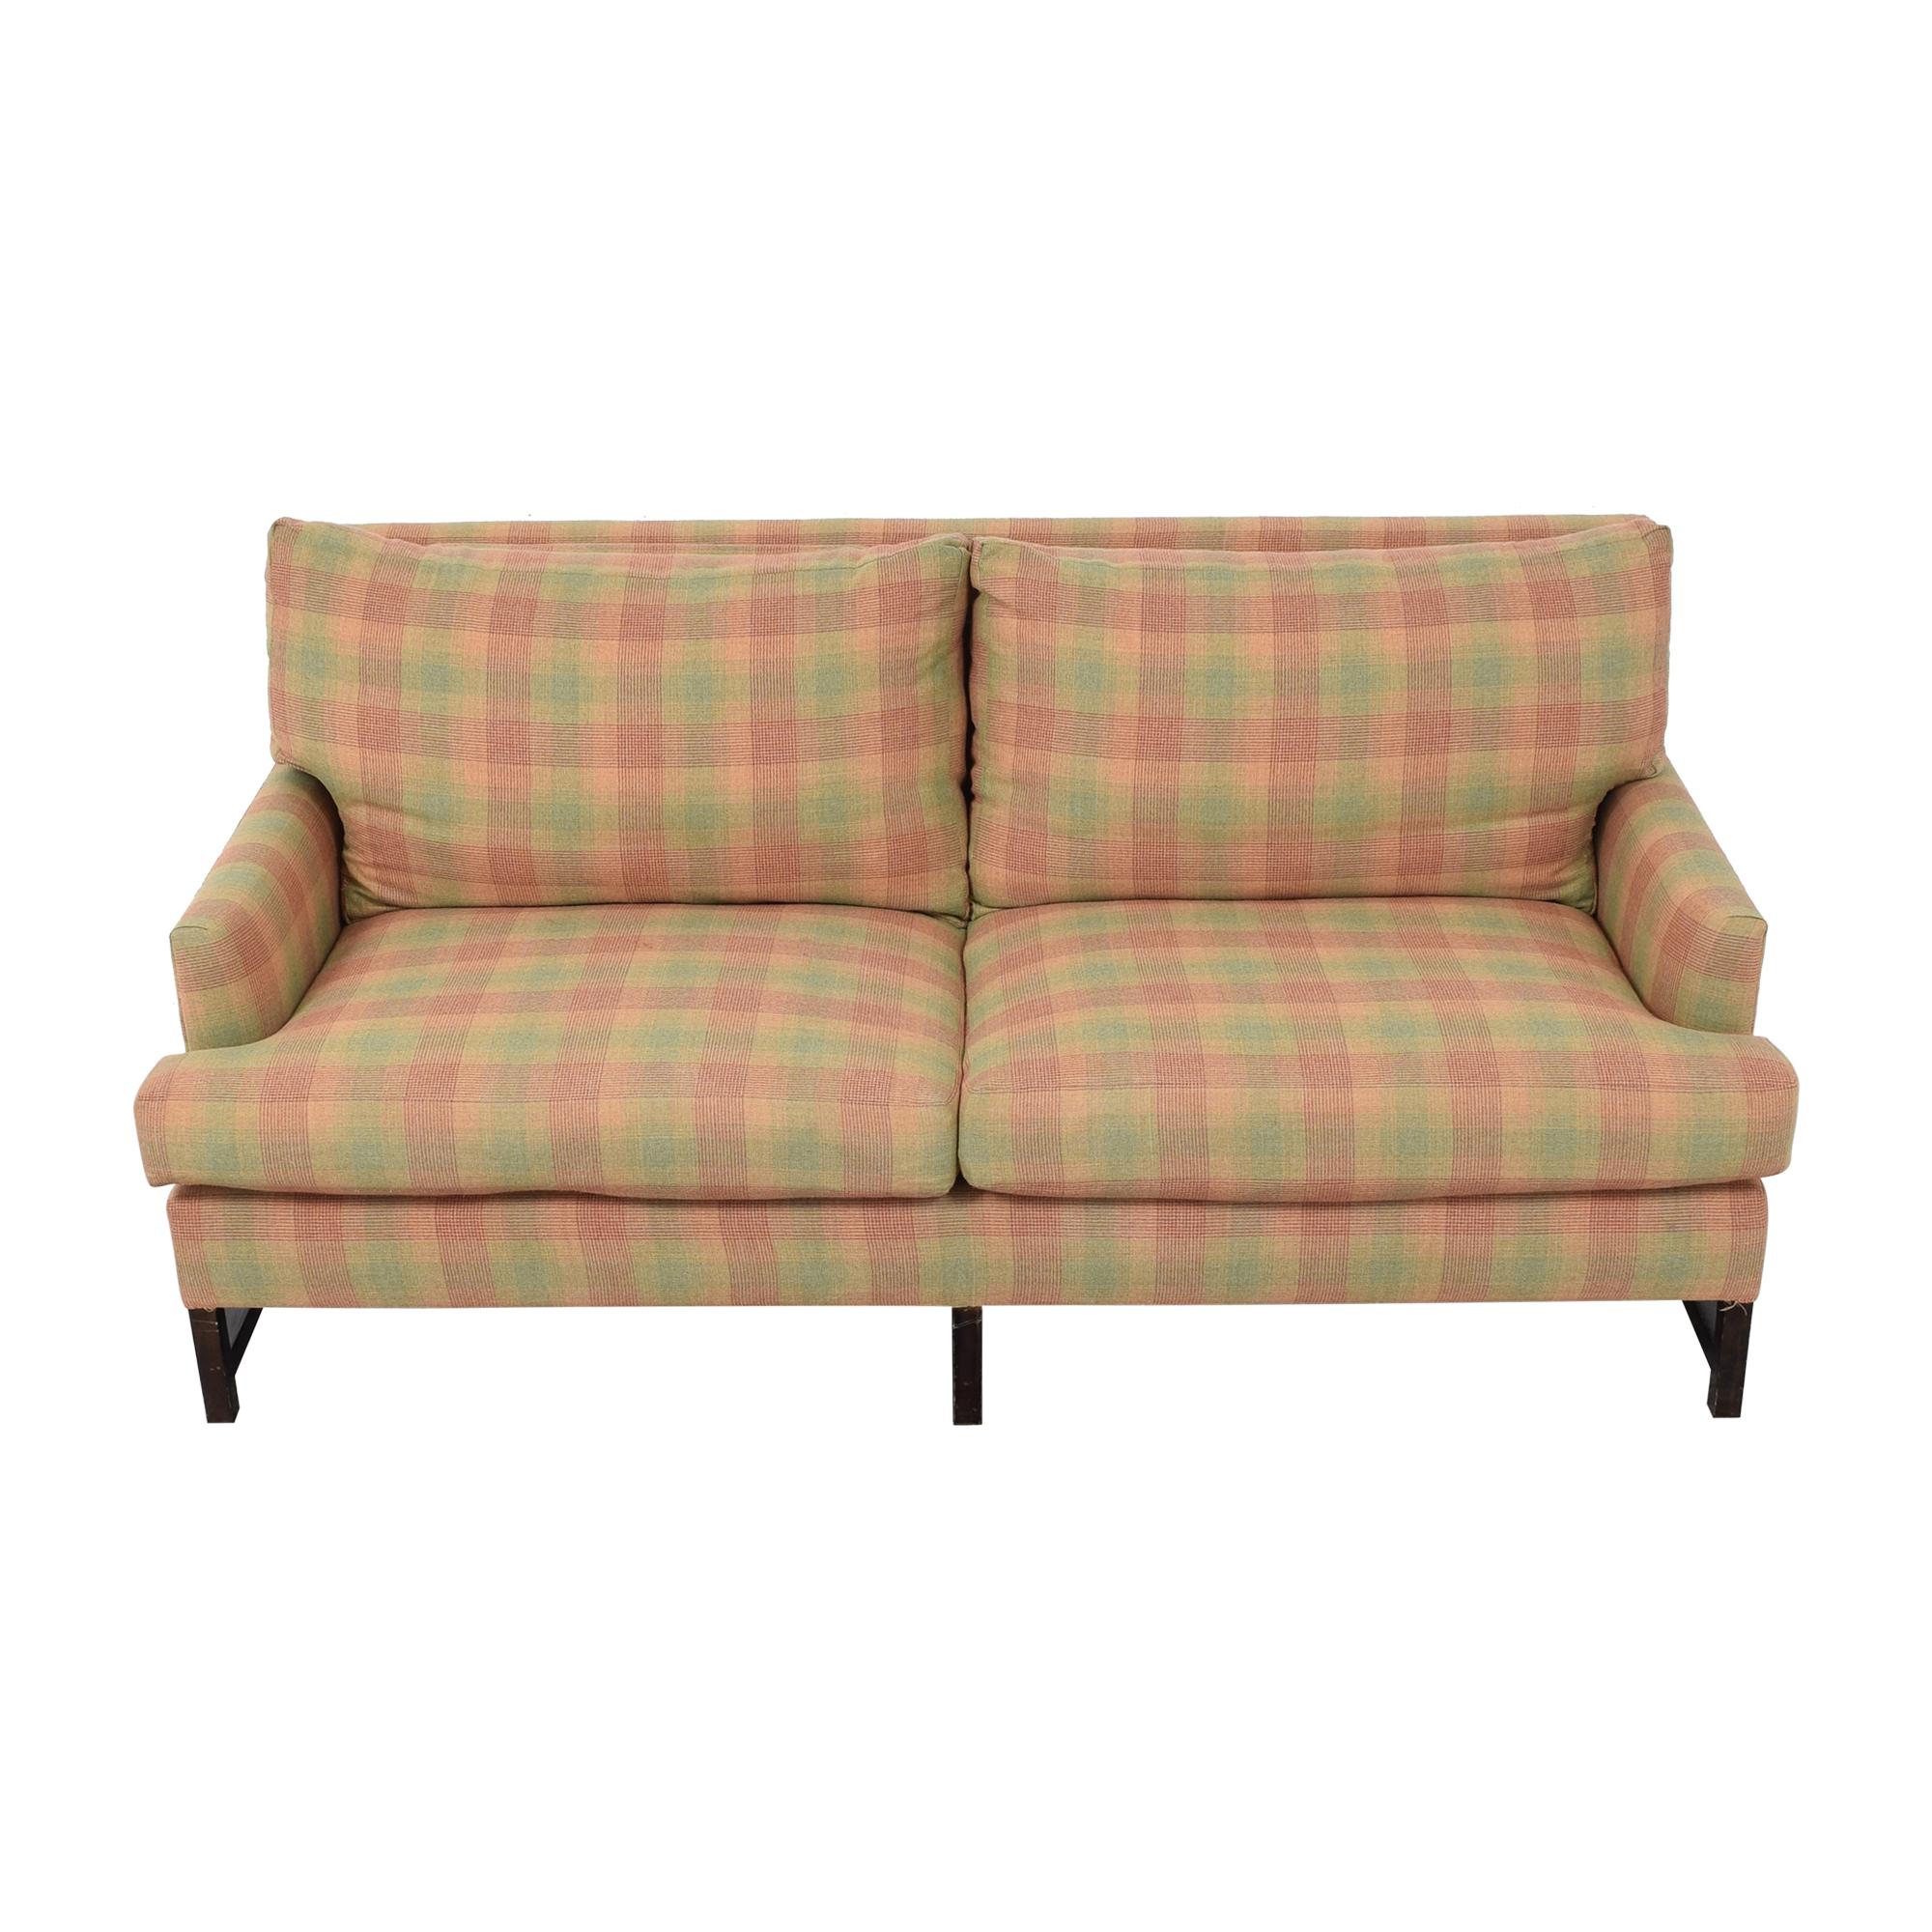 Vintage-Style Plaid Track Arm Sofa Sofas